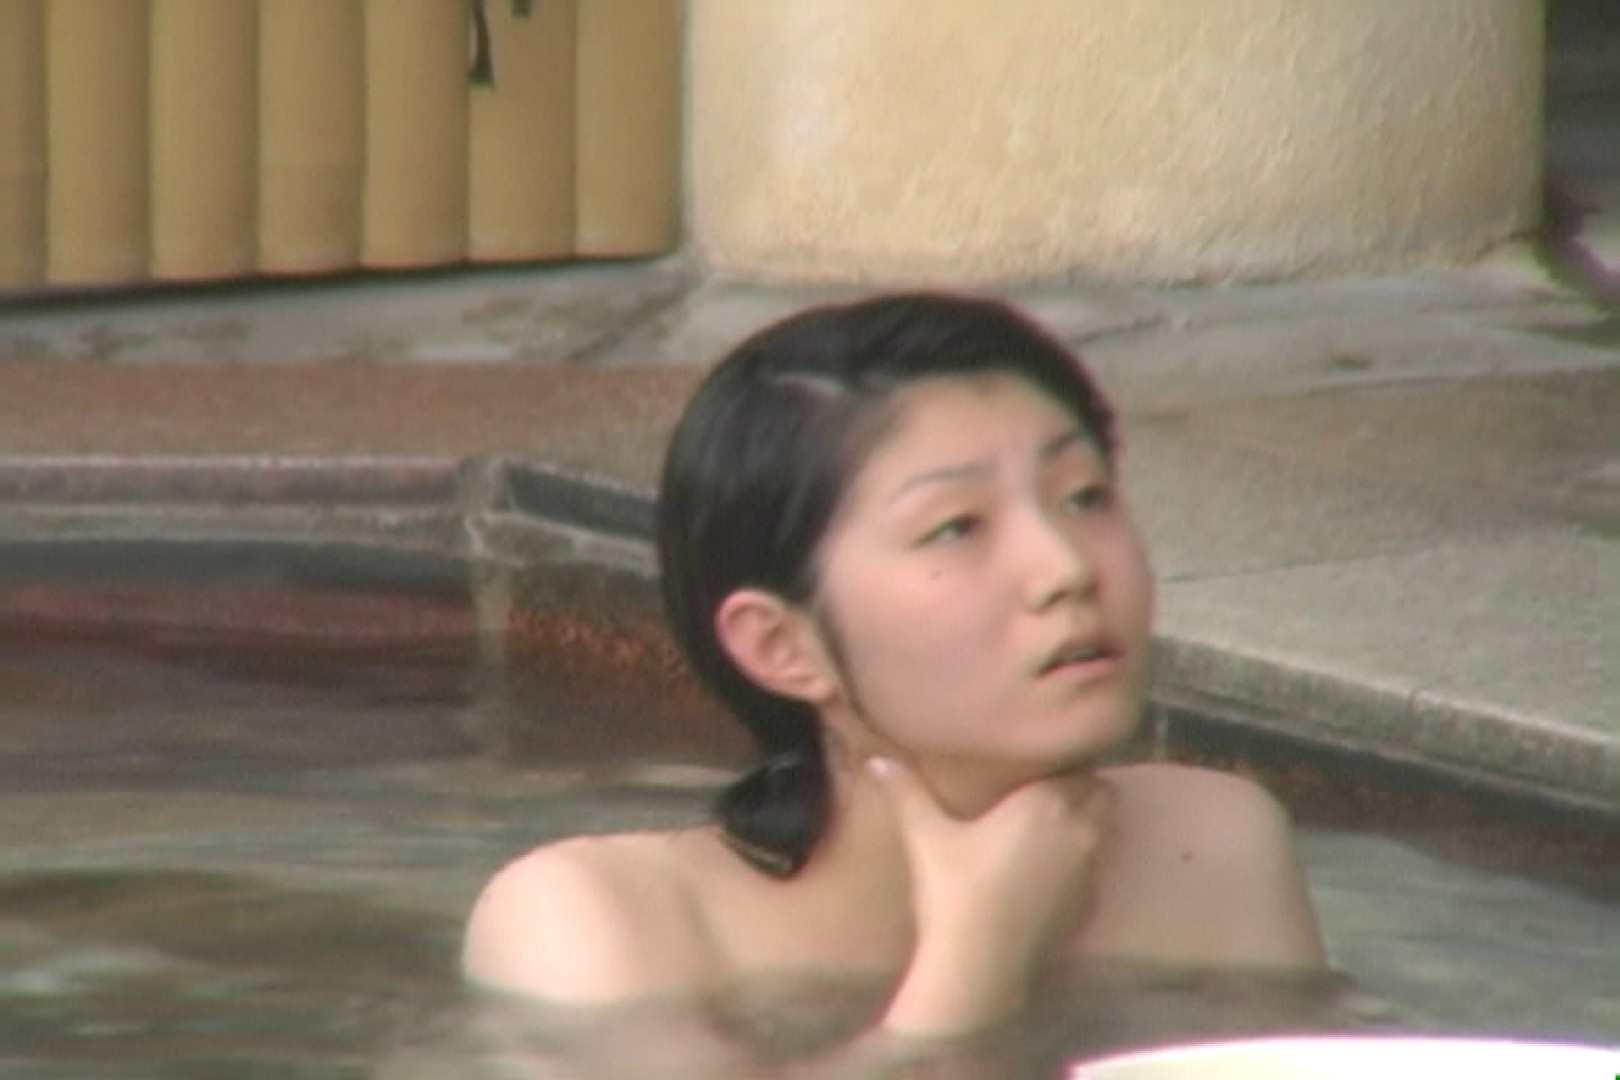 Aquaな露天風呂Vol.579 OL女体  72連発 33